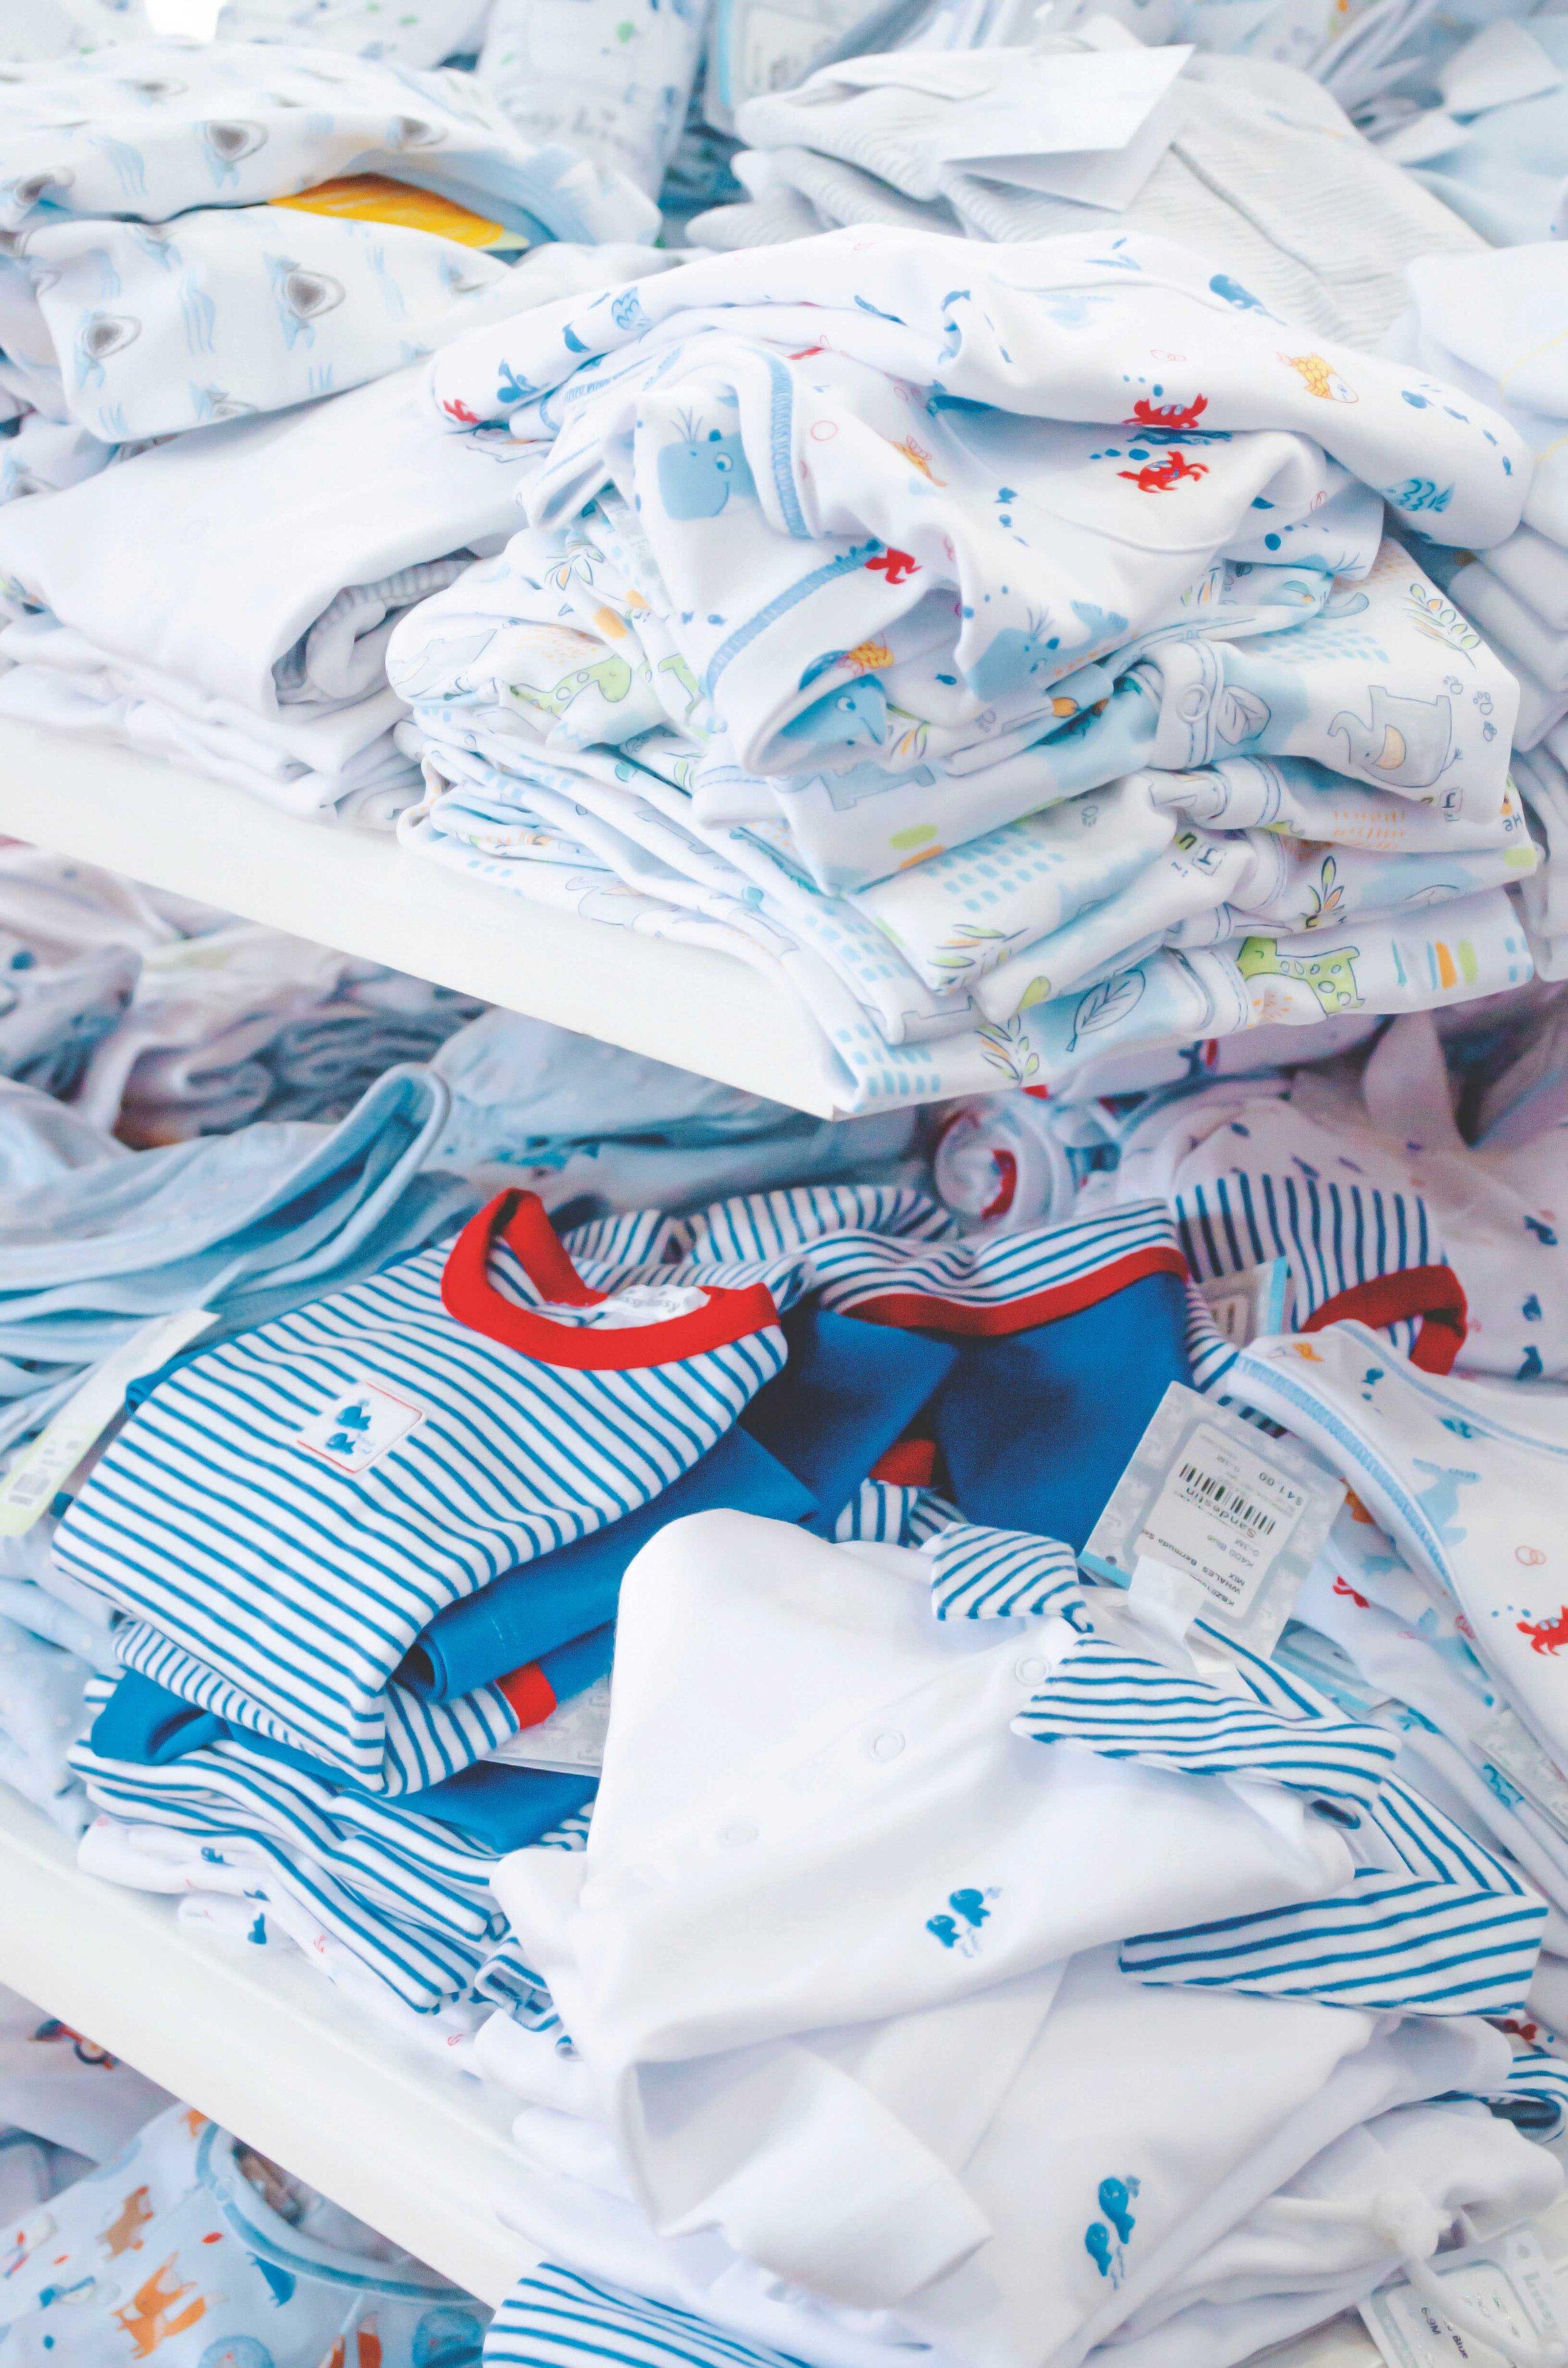 apparel-baby-clothes-blue-2252000_2.jpg